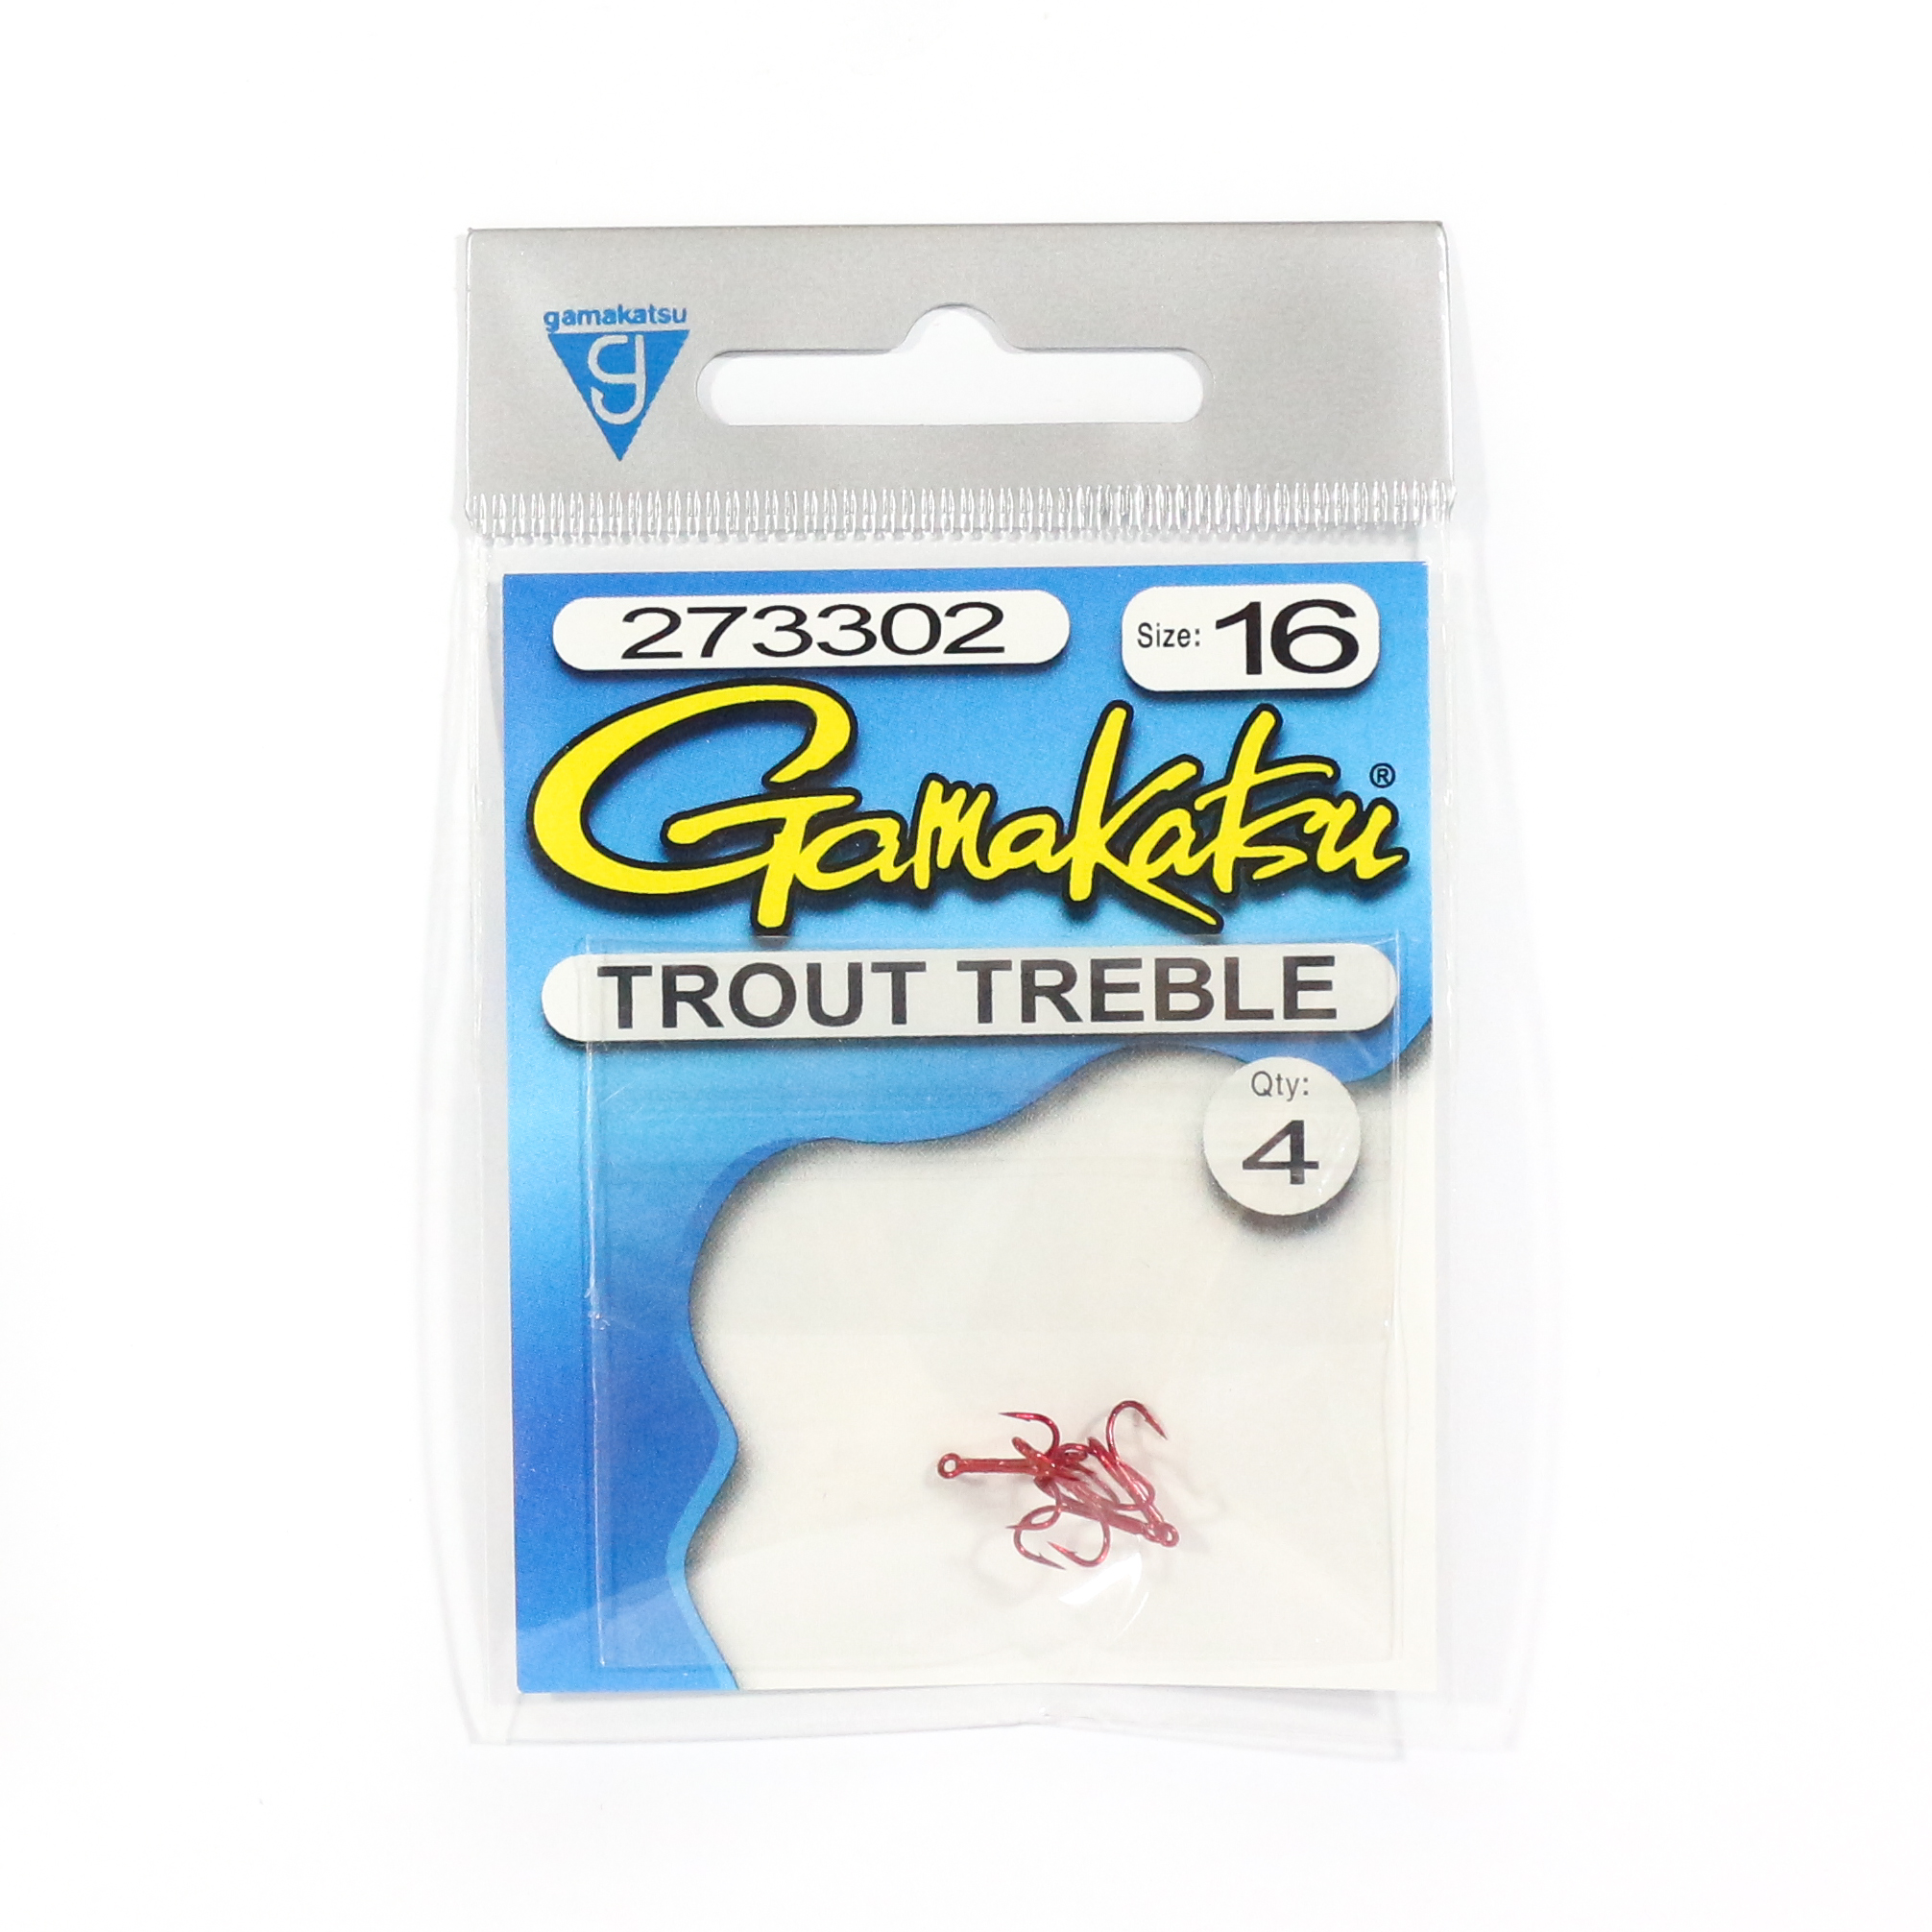 Gamakatsu Treble Hook Trout Treble Red Size 16 ,4 Per pack (9195)